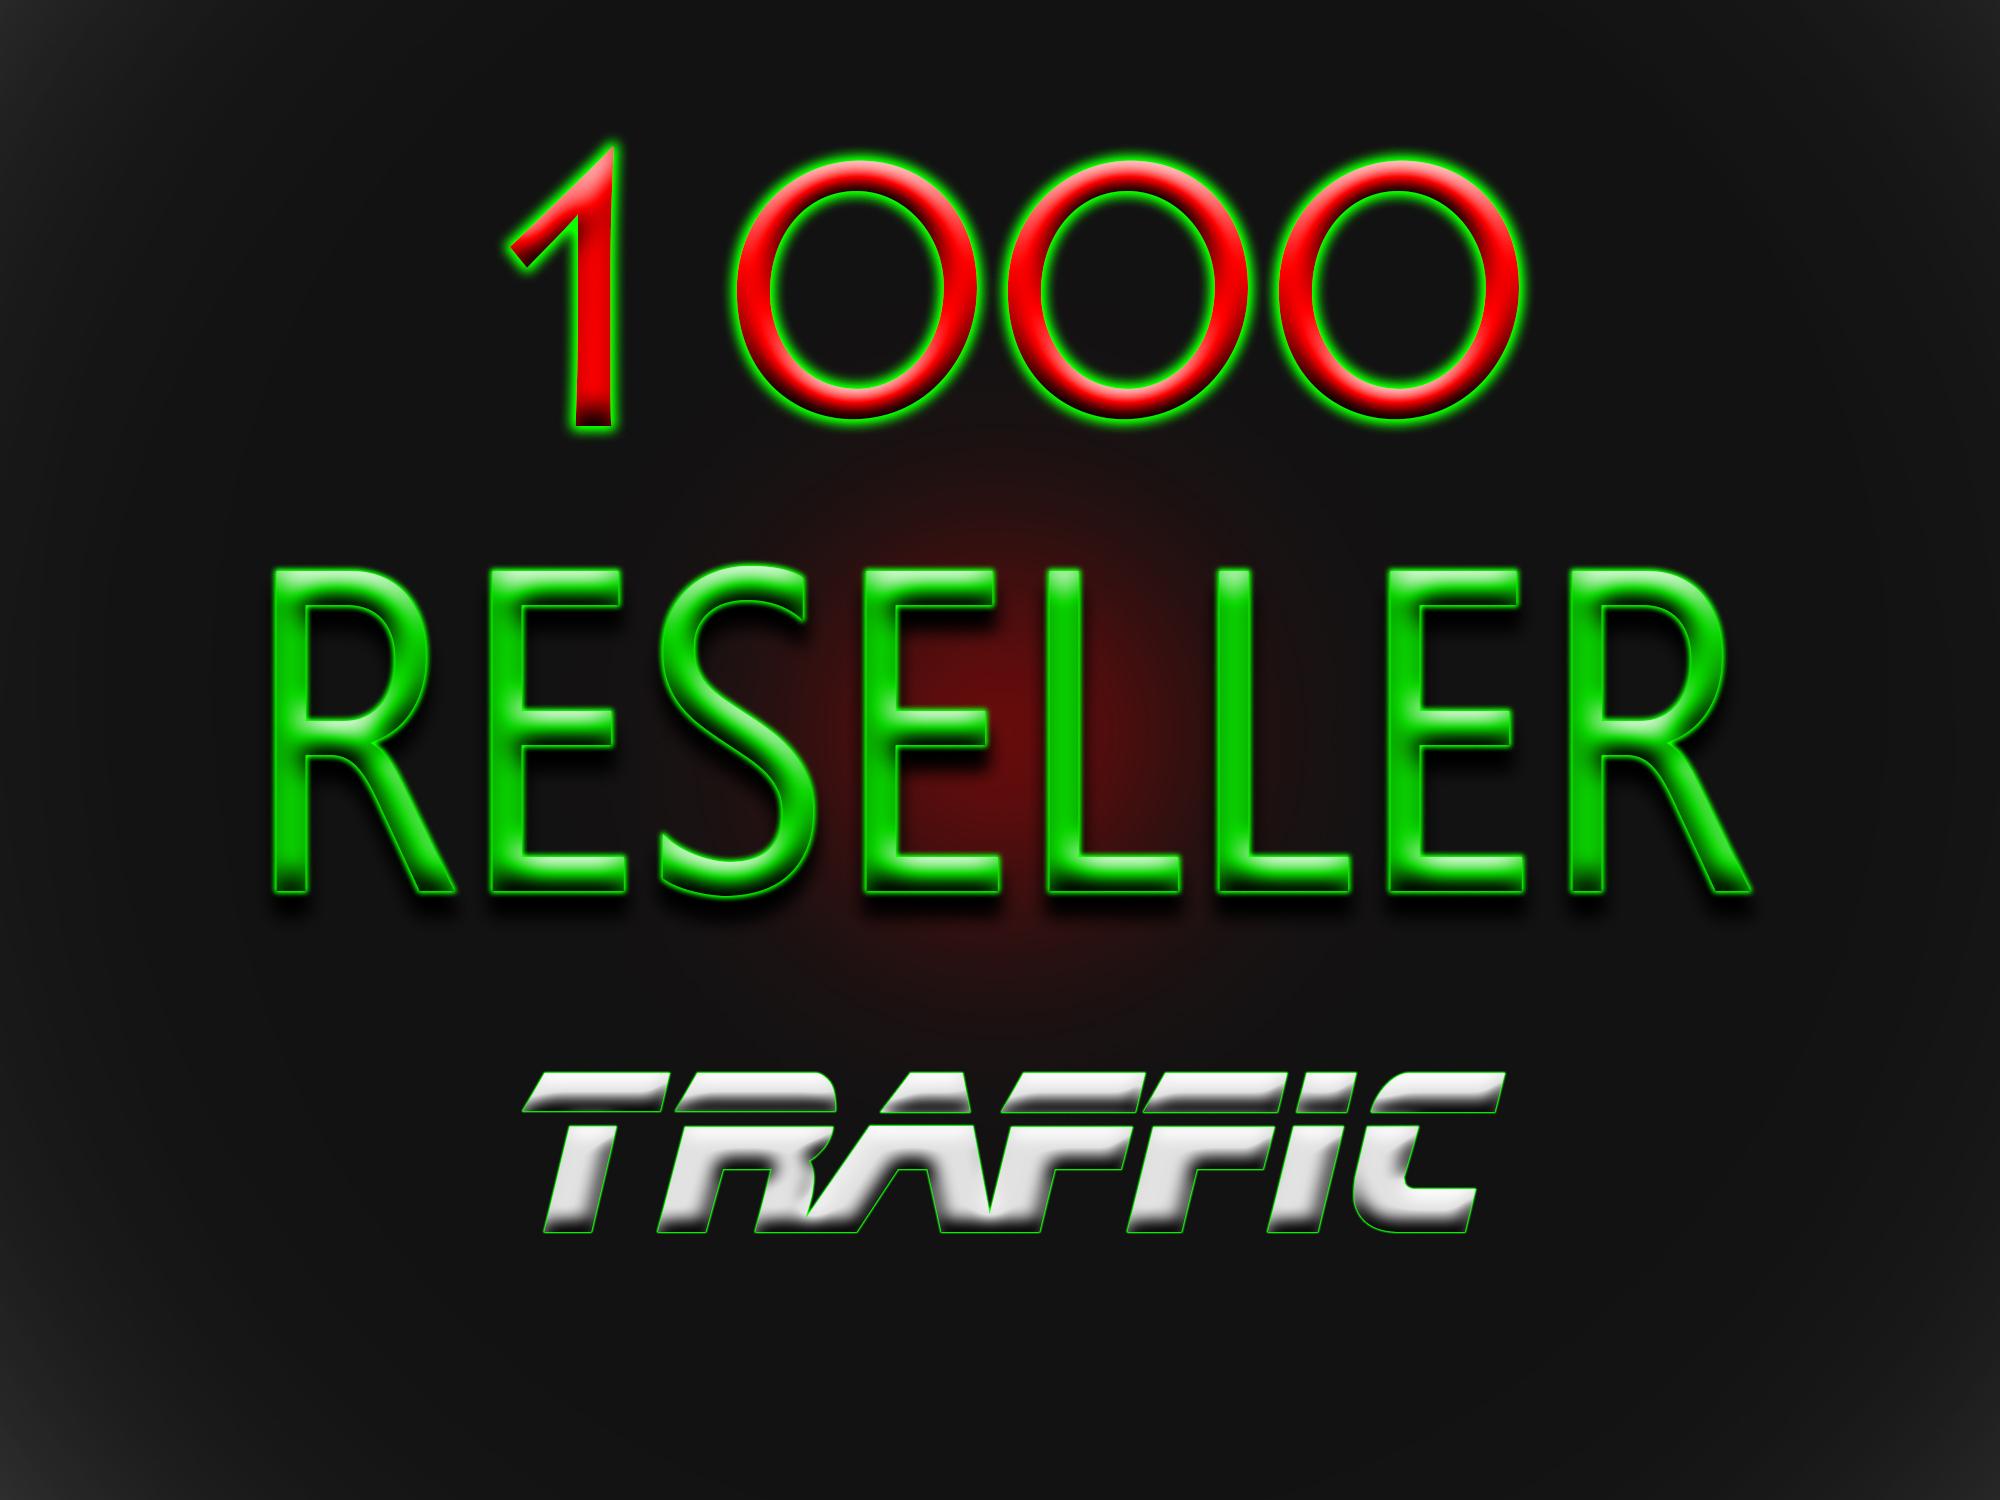 make you Web Traffic RESELLER 1000